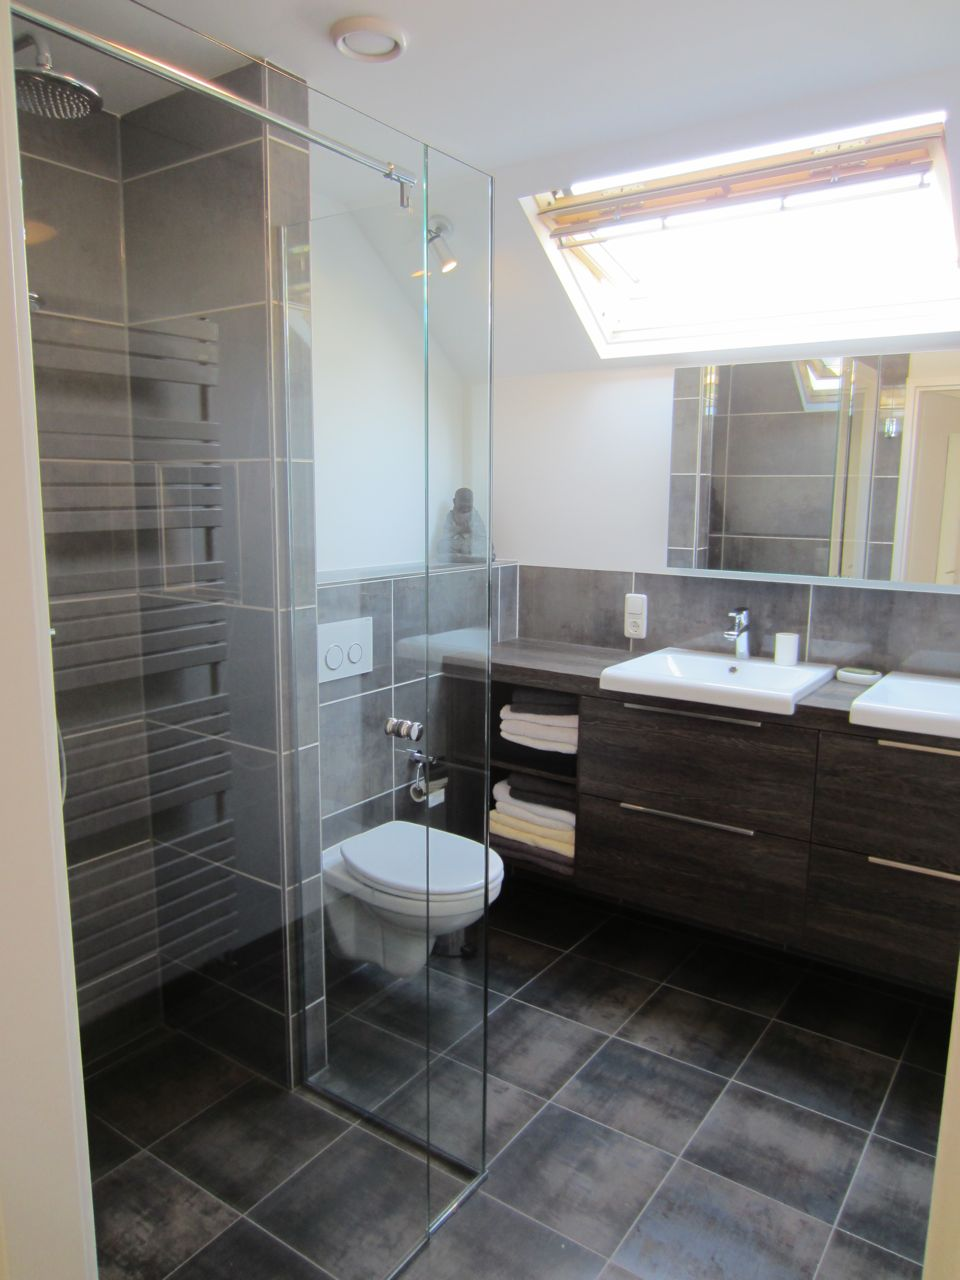 Tegels Badkamer Stroken ~ Jaap Raat Interieurbouw  Badkamers en badkamer meubilair